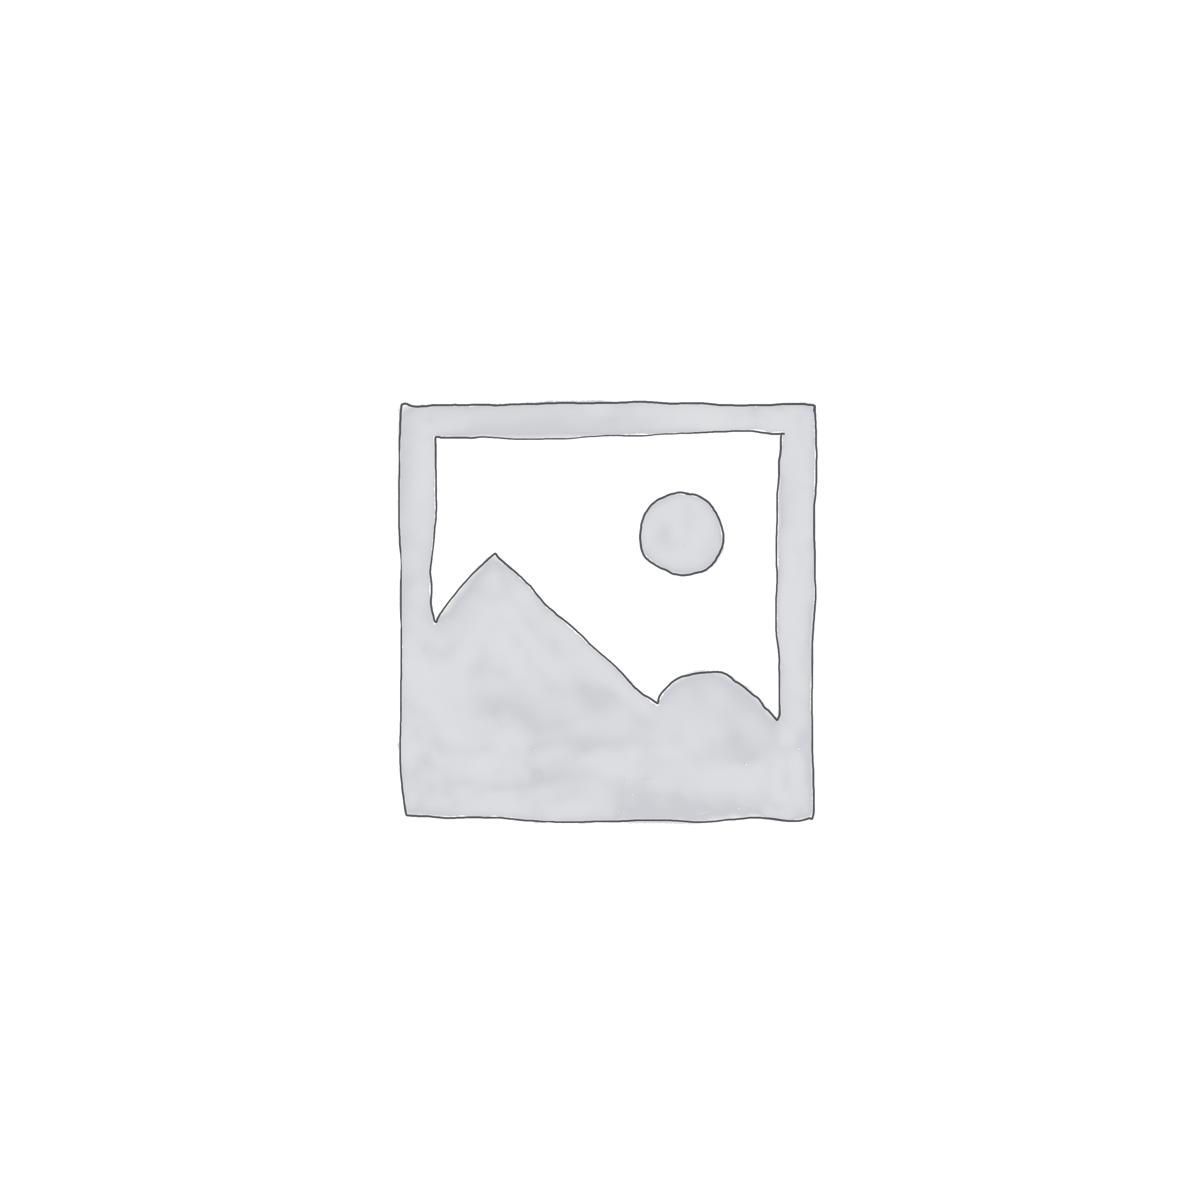 woocommerce placeholder - JCB JS200 JS220 LNC0186 Valve relief assembly (JCB)